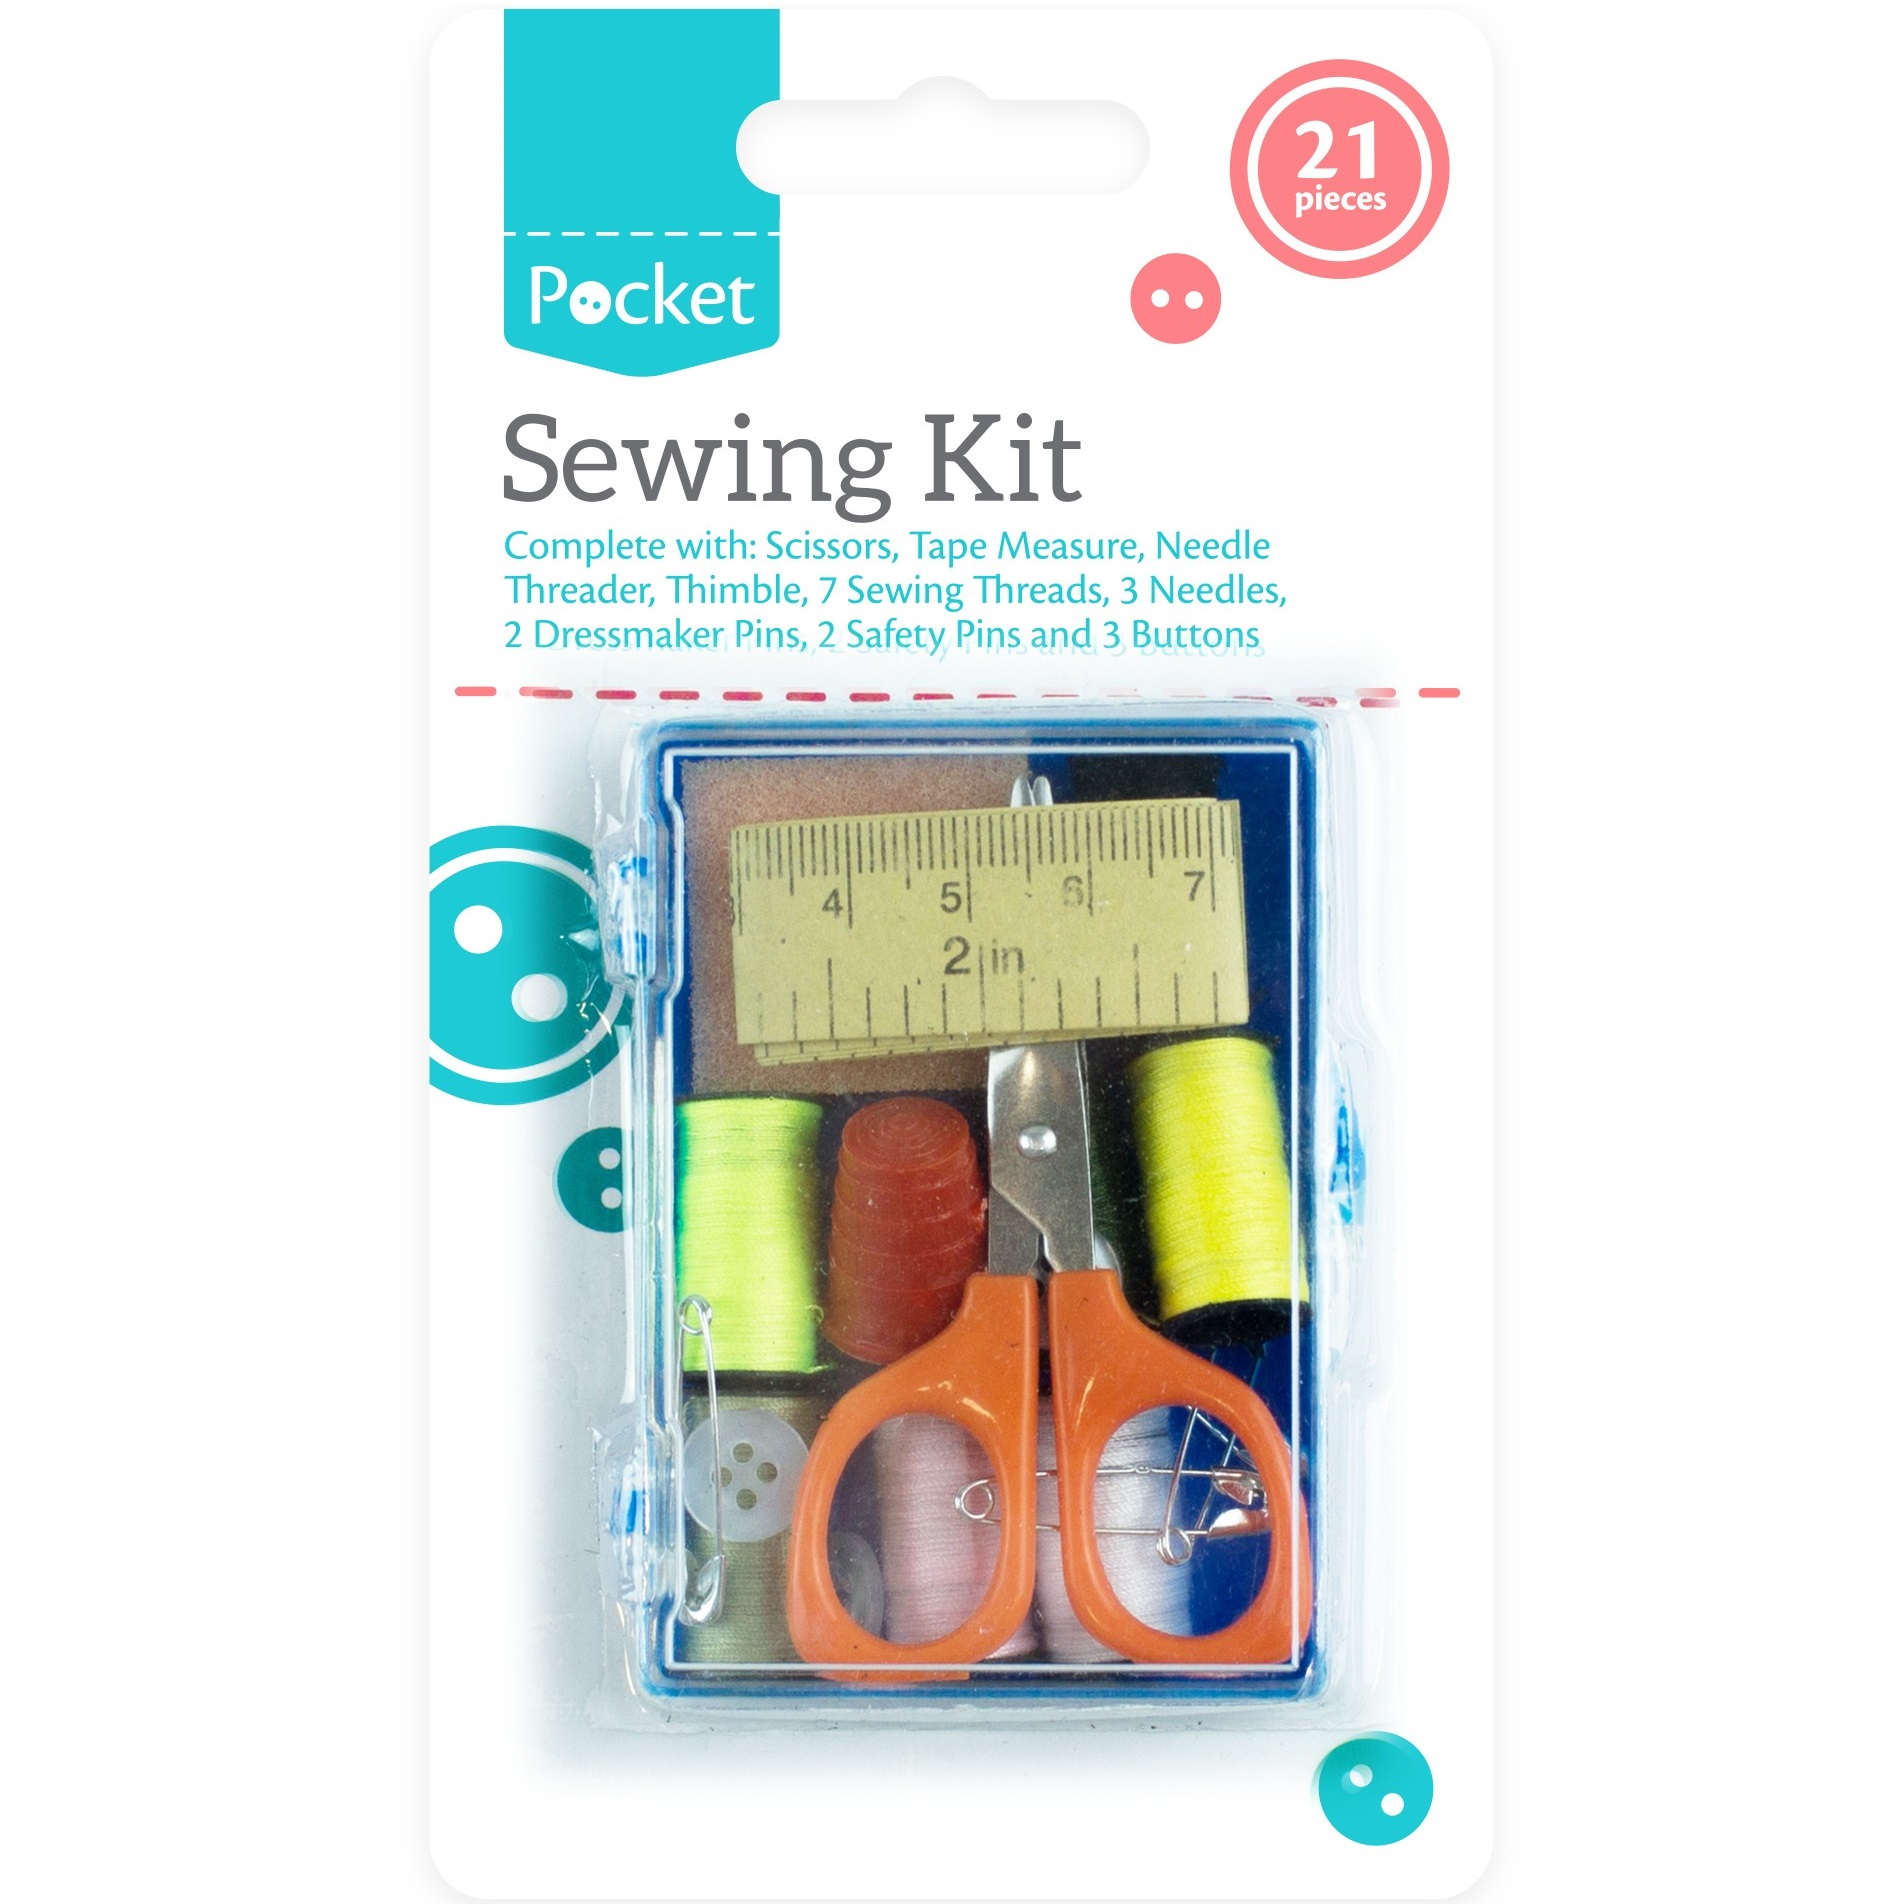 New 21pc Travel Sewing Kit Thread Needles Mini Case With Scissors Tape Pin Set